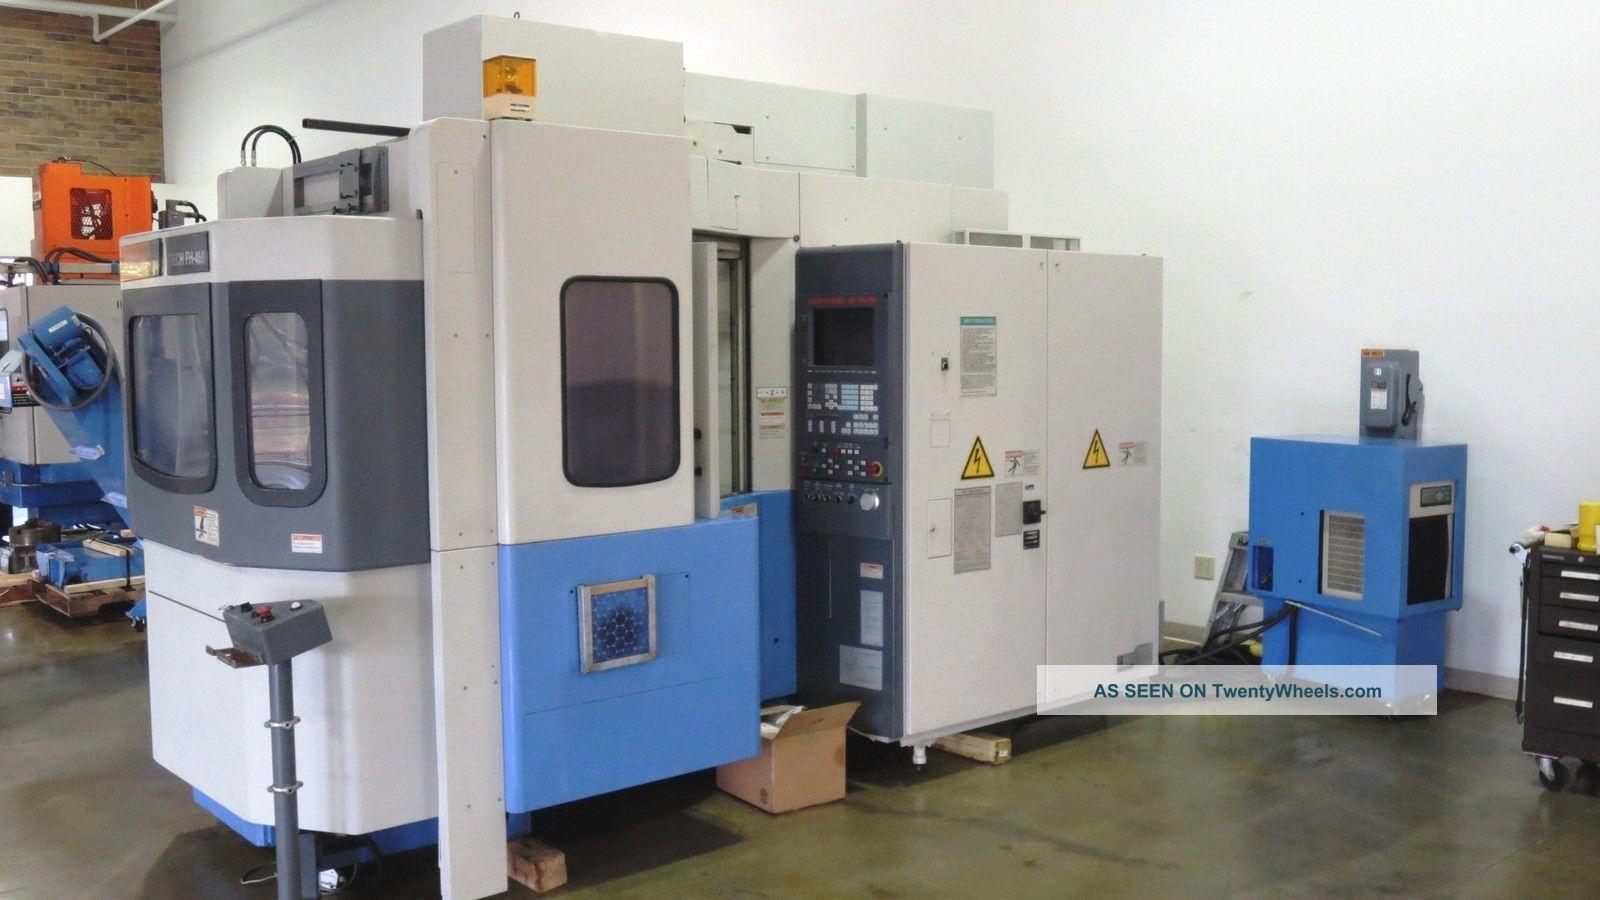 Mazak Fh 480 Hmc,  Horizontal Machining Center,  Mazak,  Cnc Hmc,  Cnc Milling Machines photo